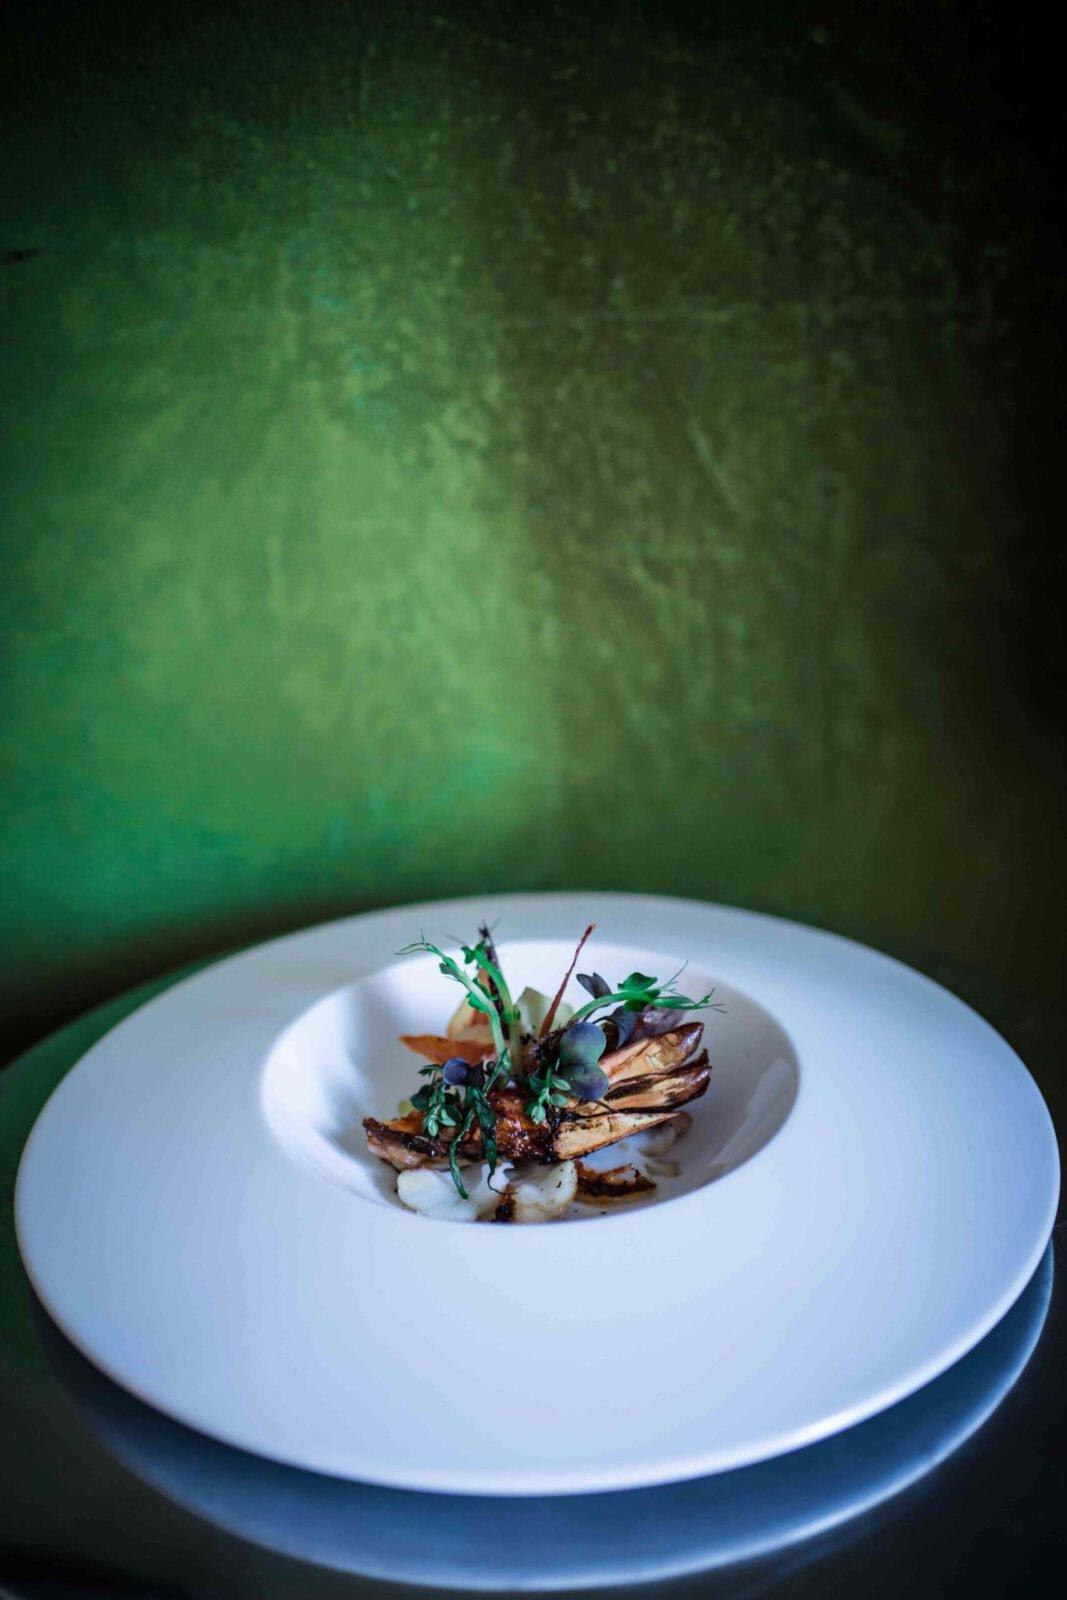 das mechanische auge-food fotografie- düsseldorf